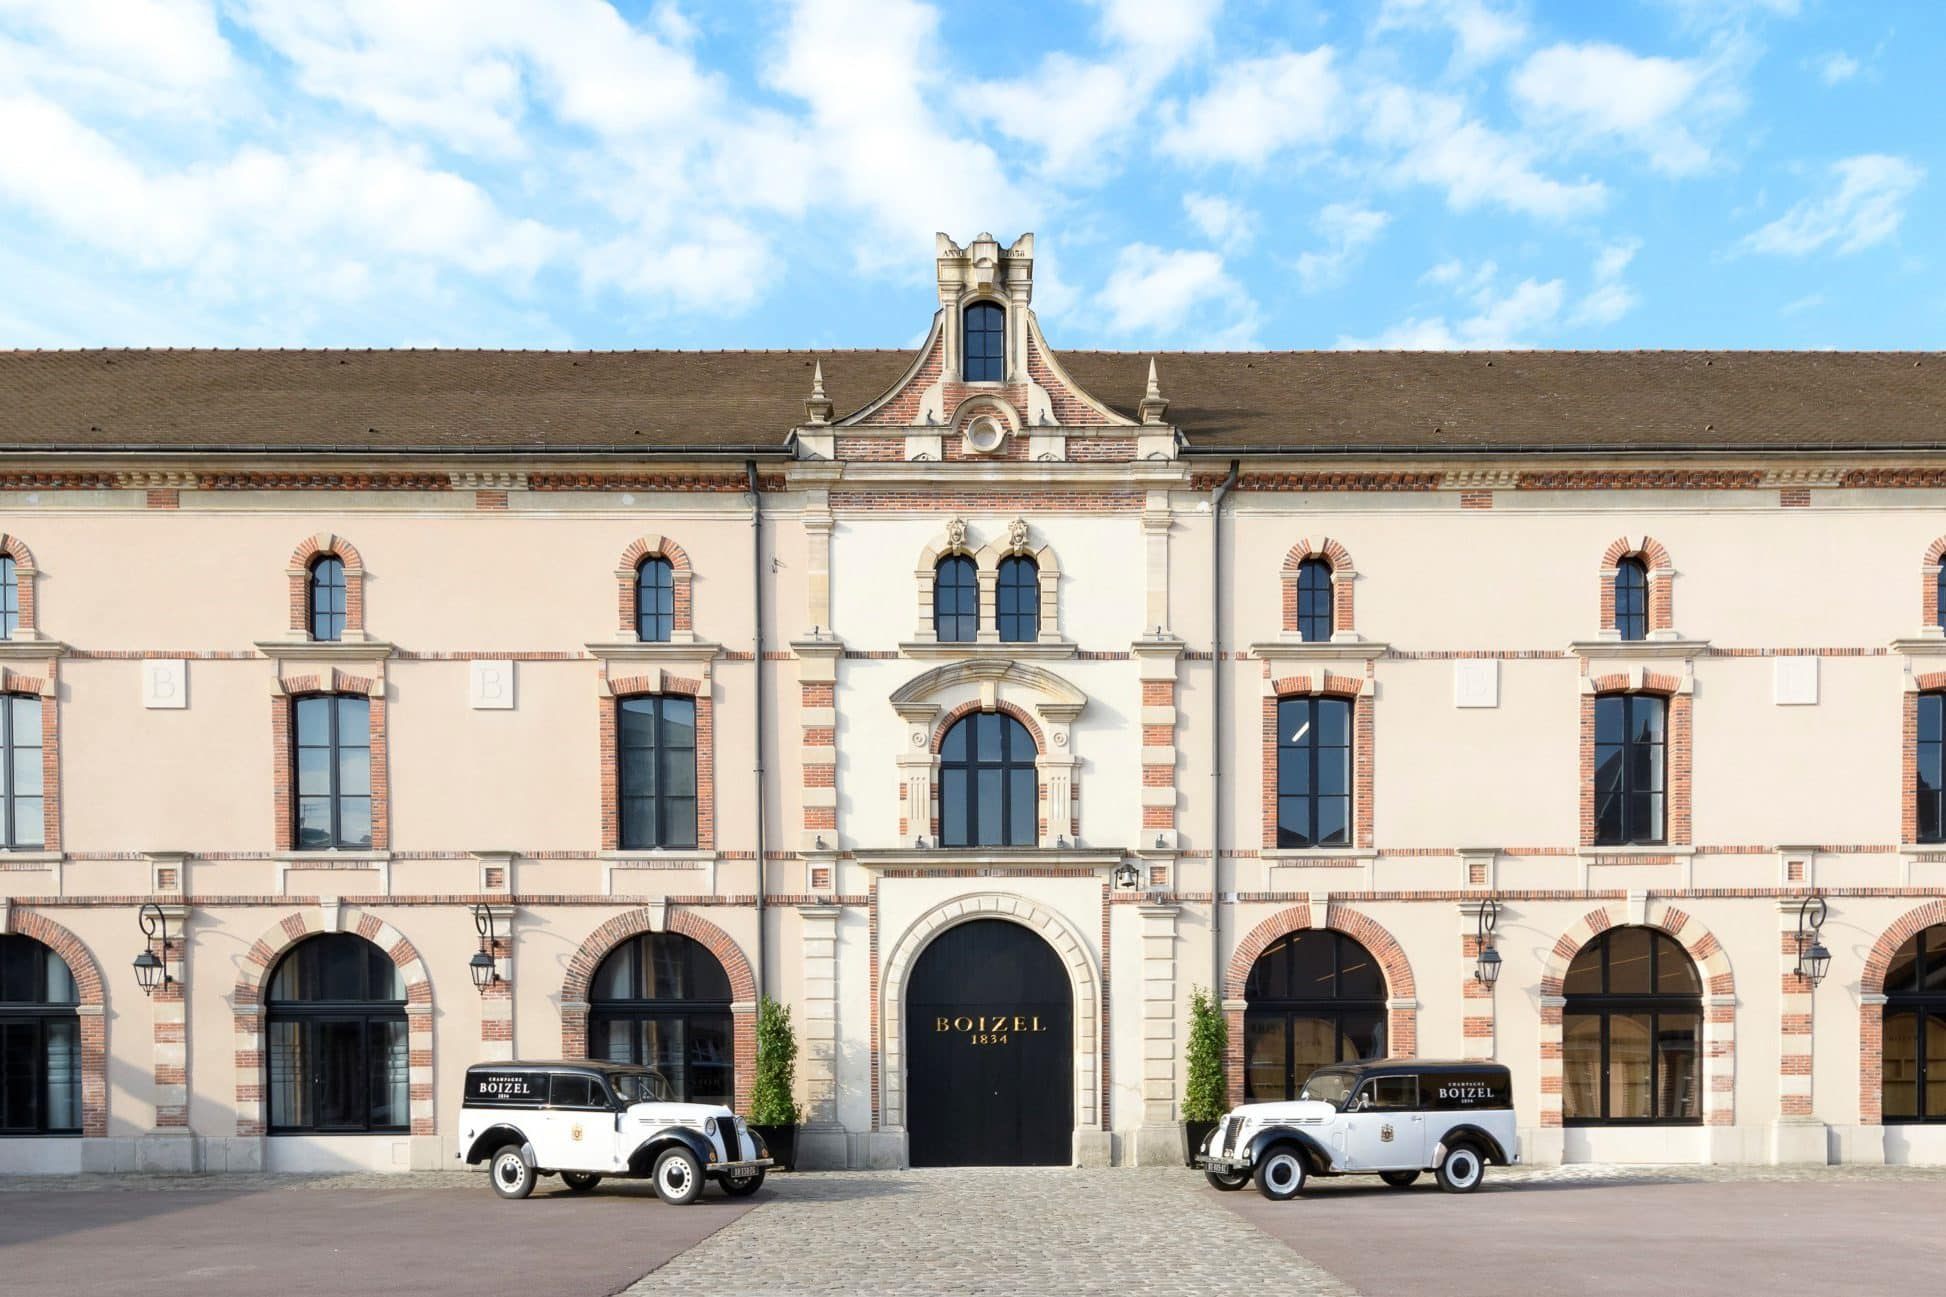 Chateau of Boizel Champagne, France